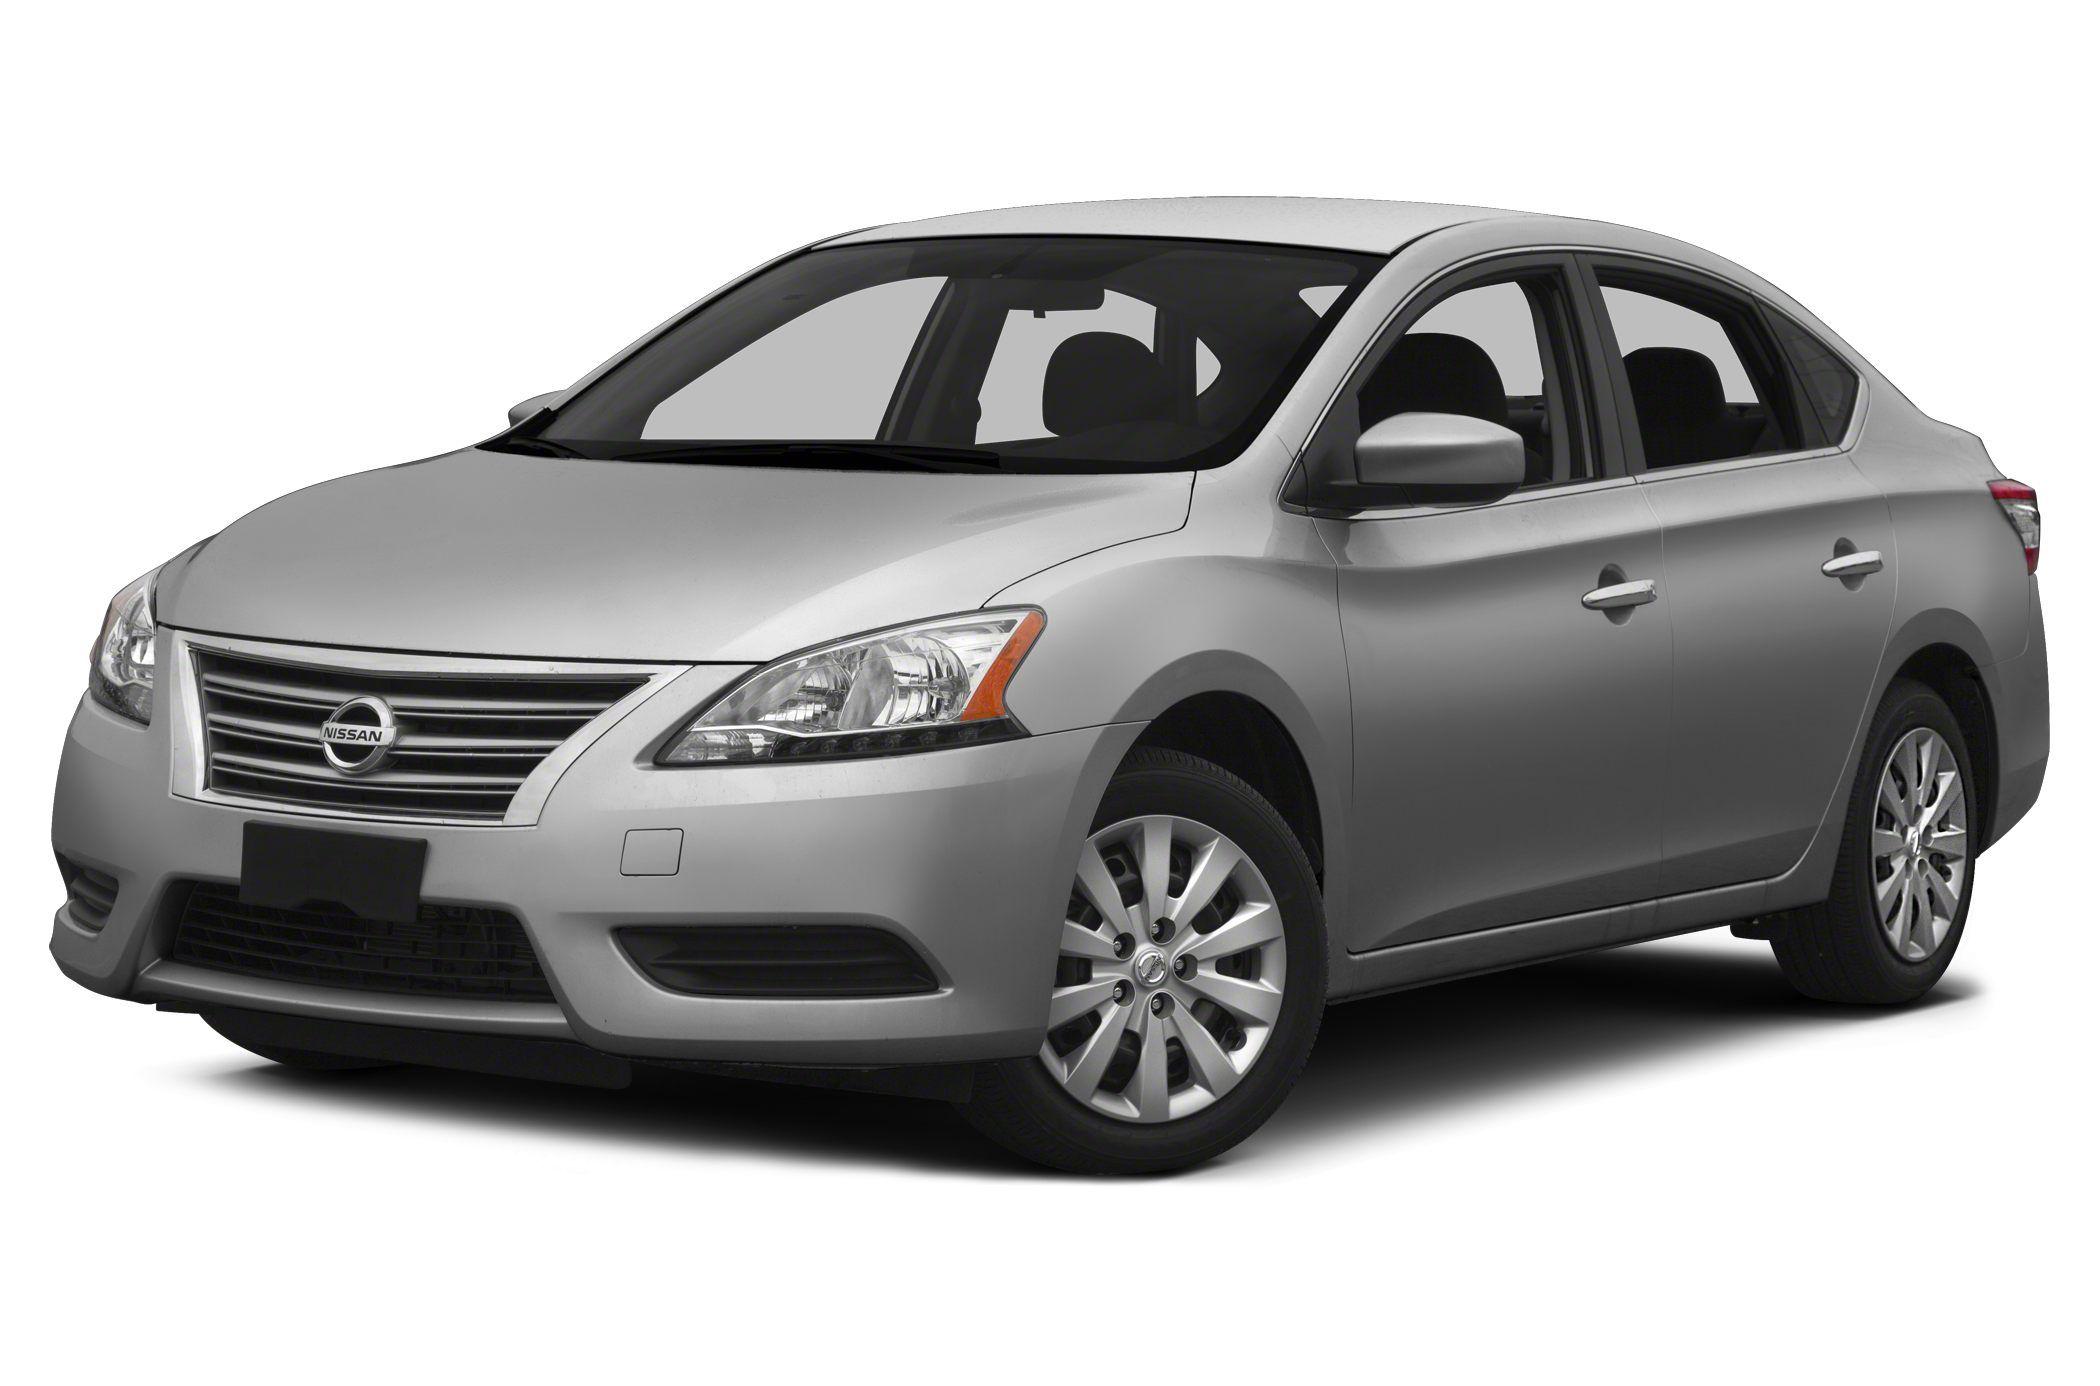 ?img=cac30nic061b121001 Nissan sentra, Nissan, Nissan cars